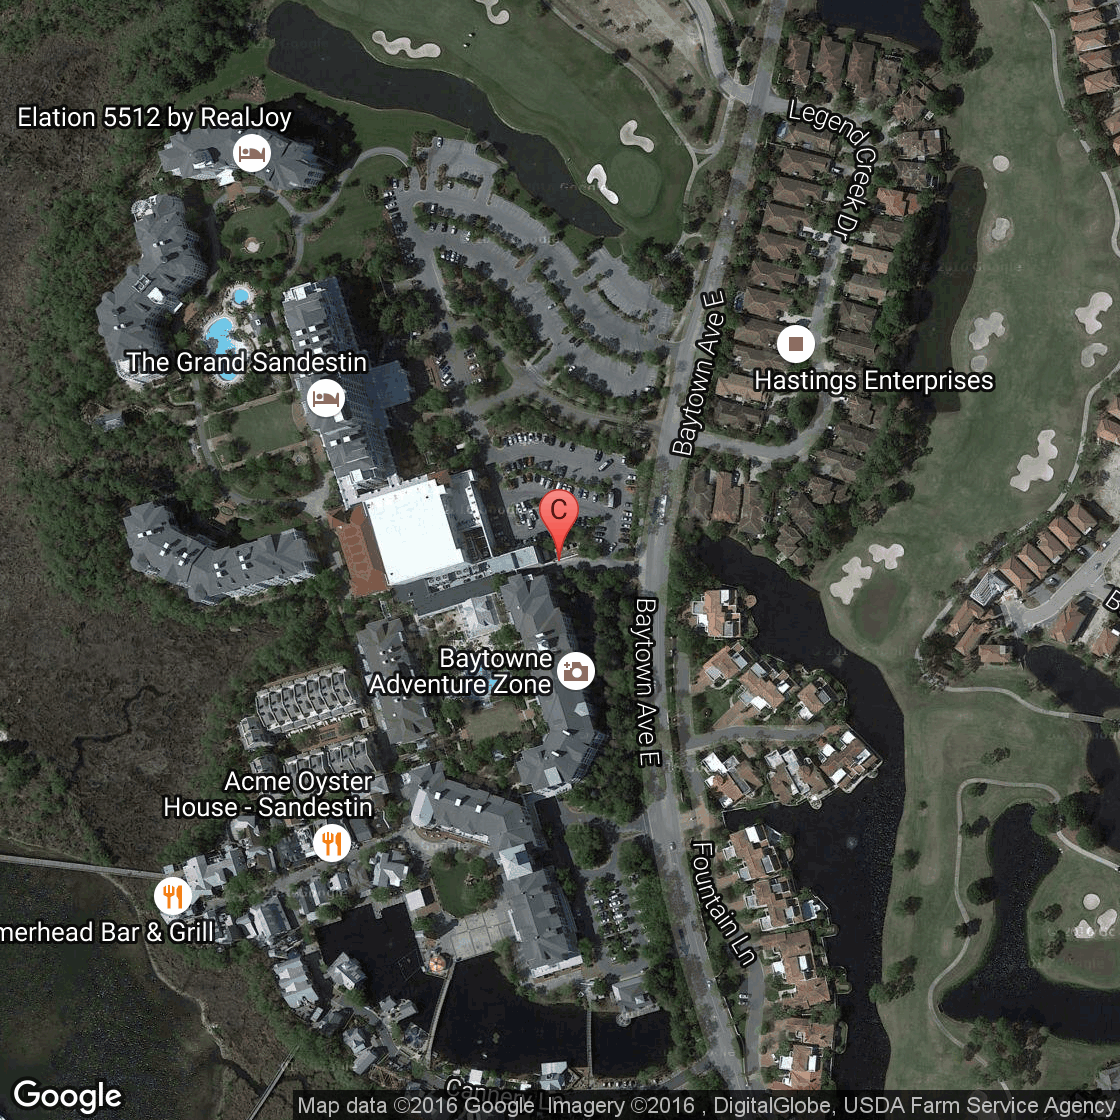 Hotels Near Baytowne Wharf In Destin Florida